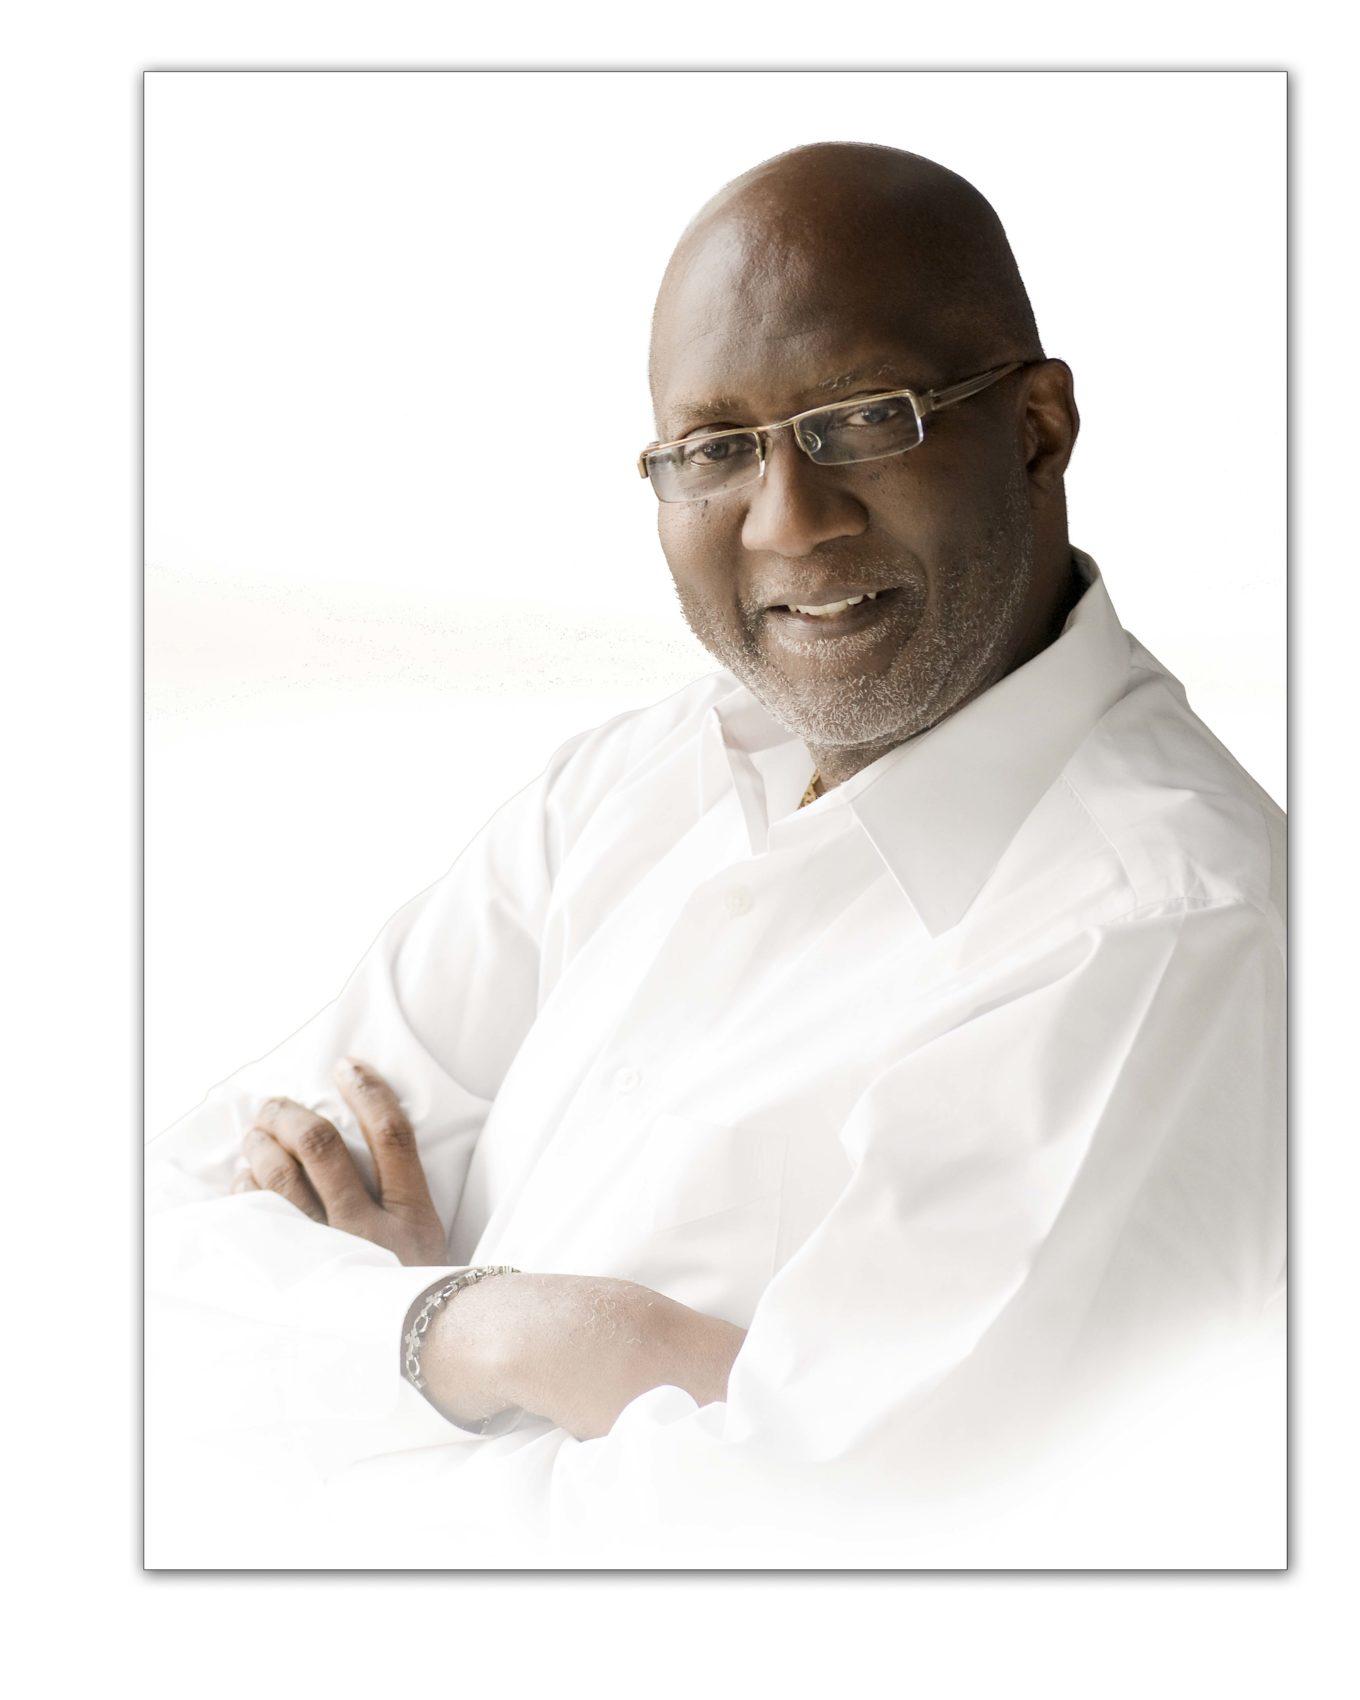 Head shots of man in white shirt